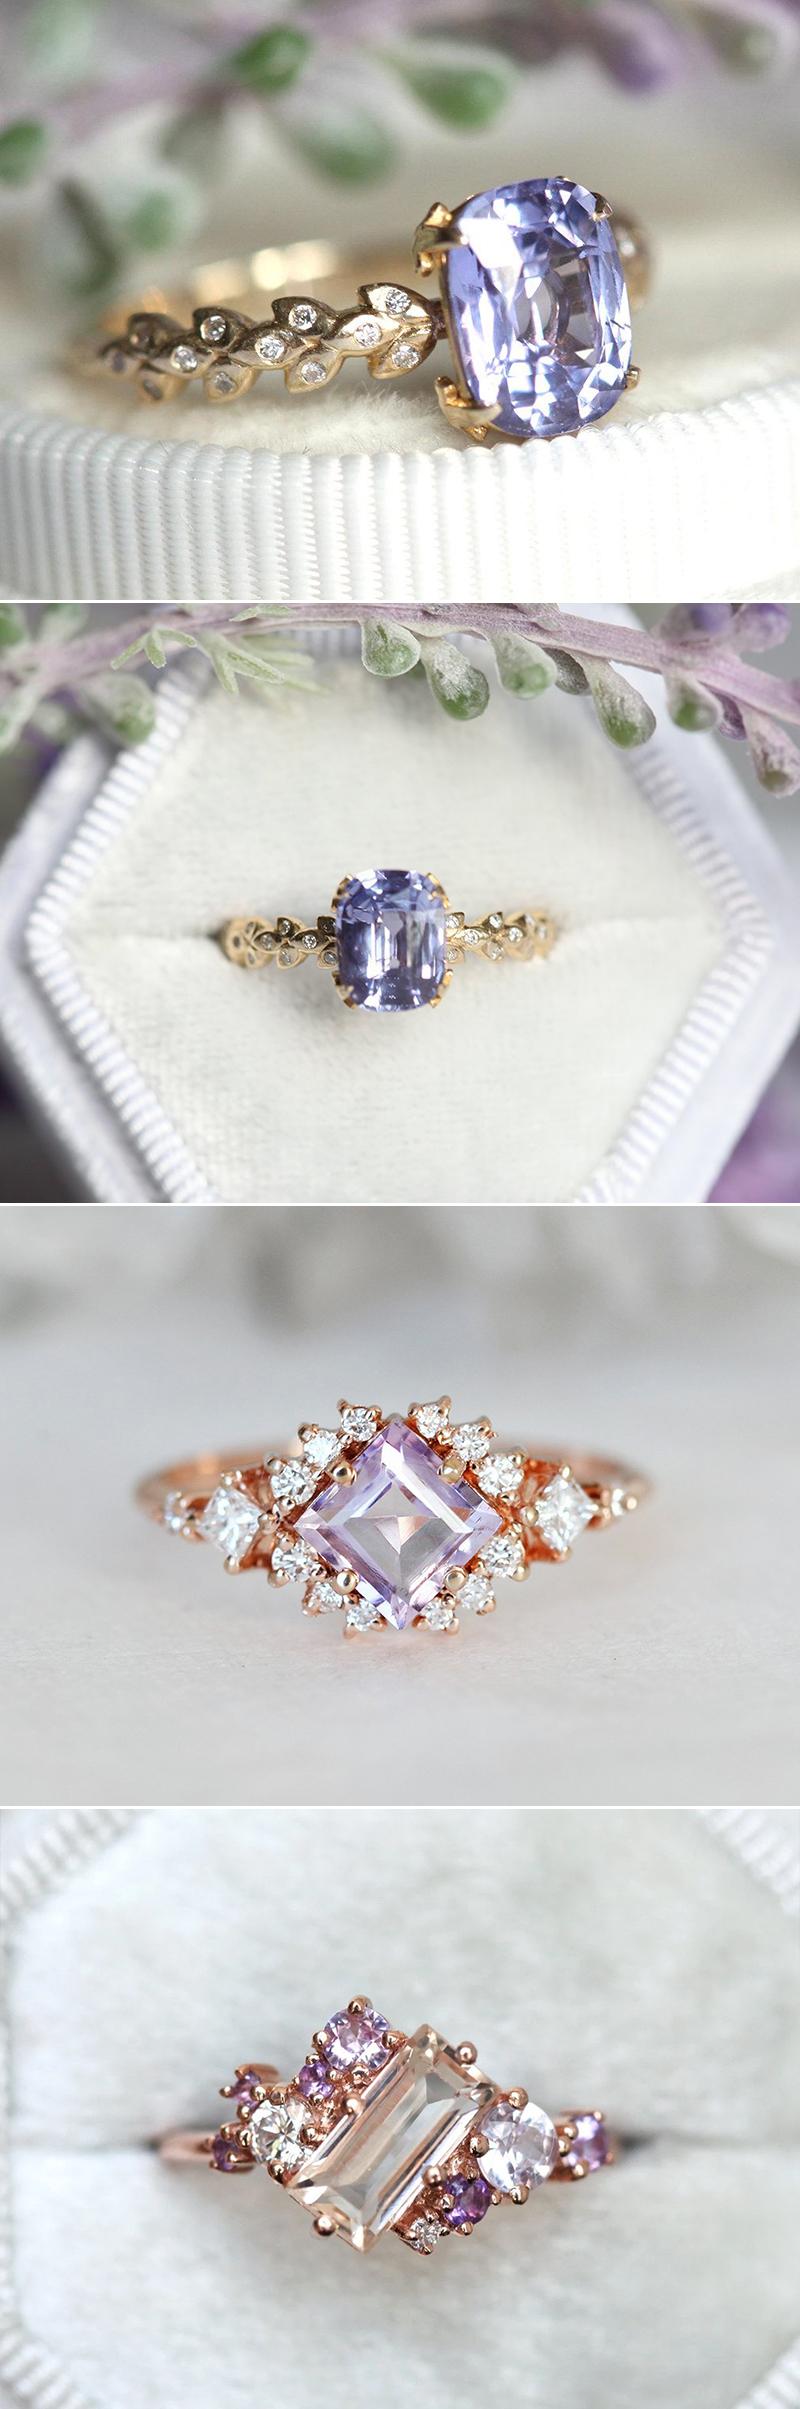 colored stone gemstone engagement ring